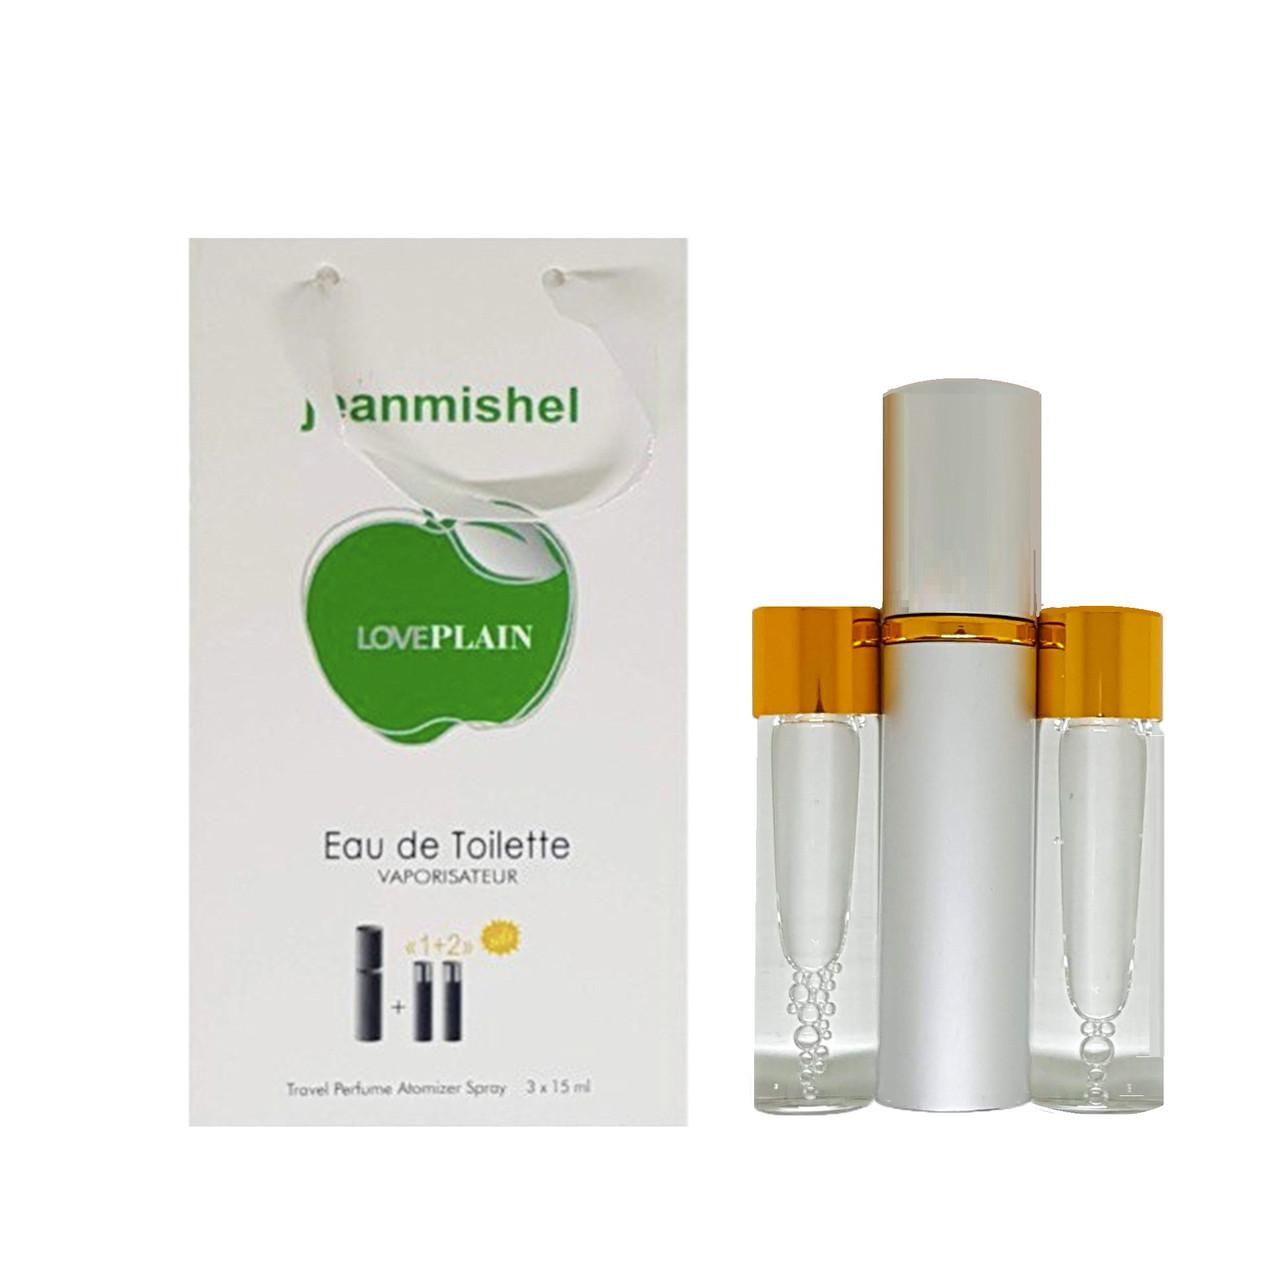 Jeanmishel Love Plain (63) 3 x 15 ml